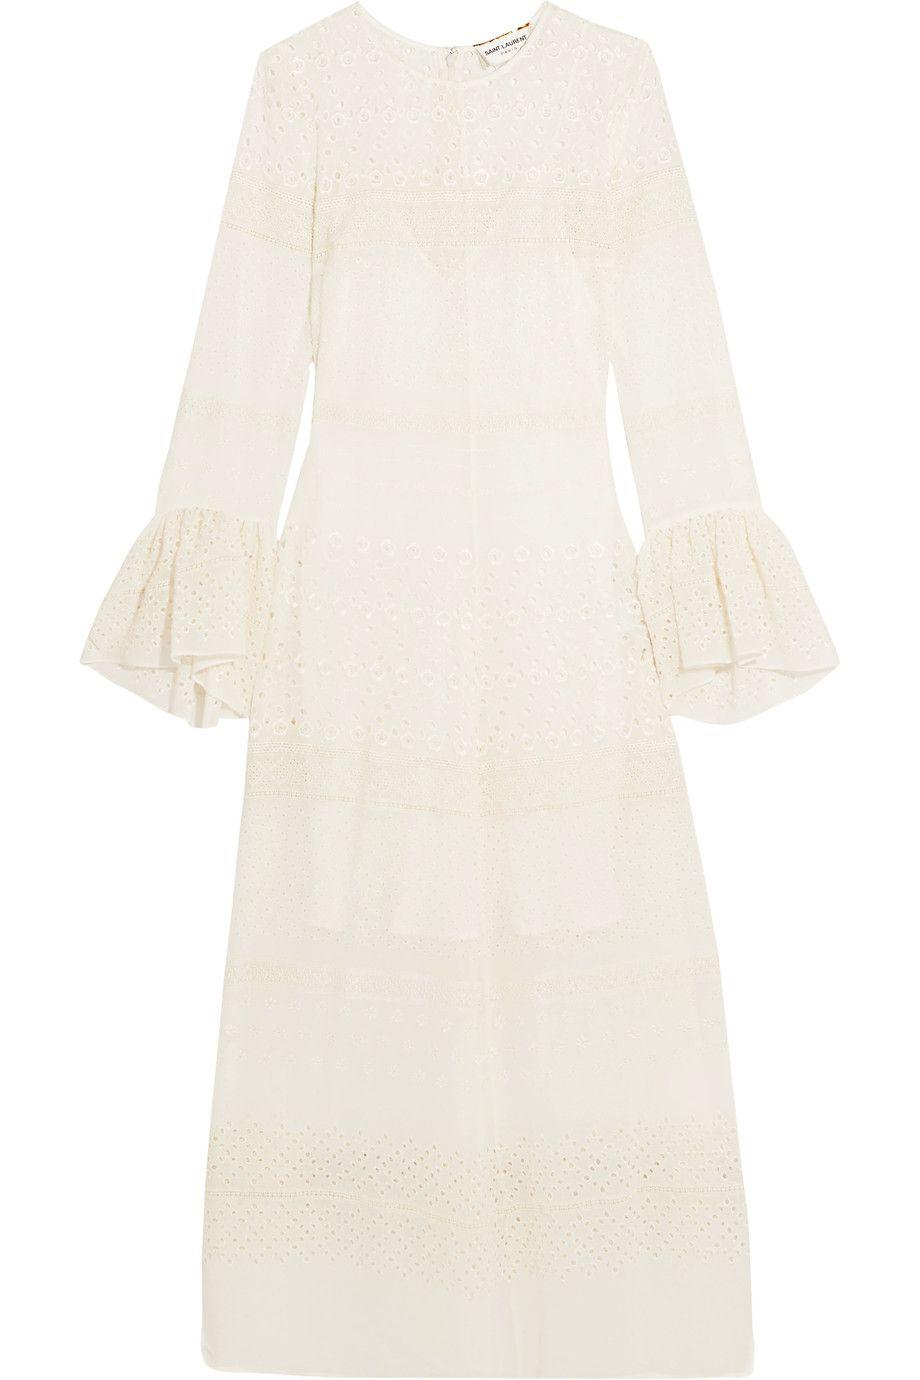 Saint Laurent | Ruffled broderie anglaise georgette midi dress | NET-A-PORTER.COM